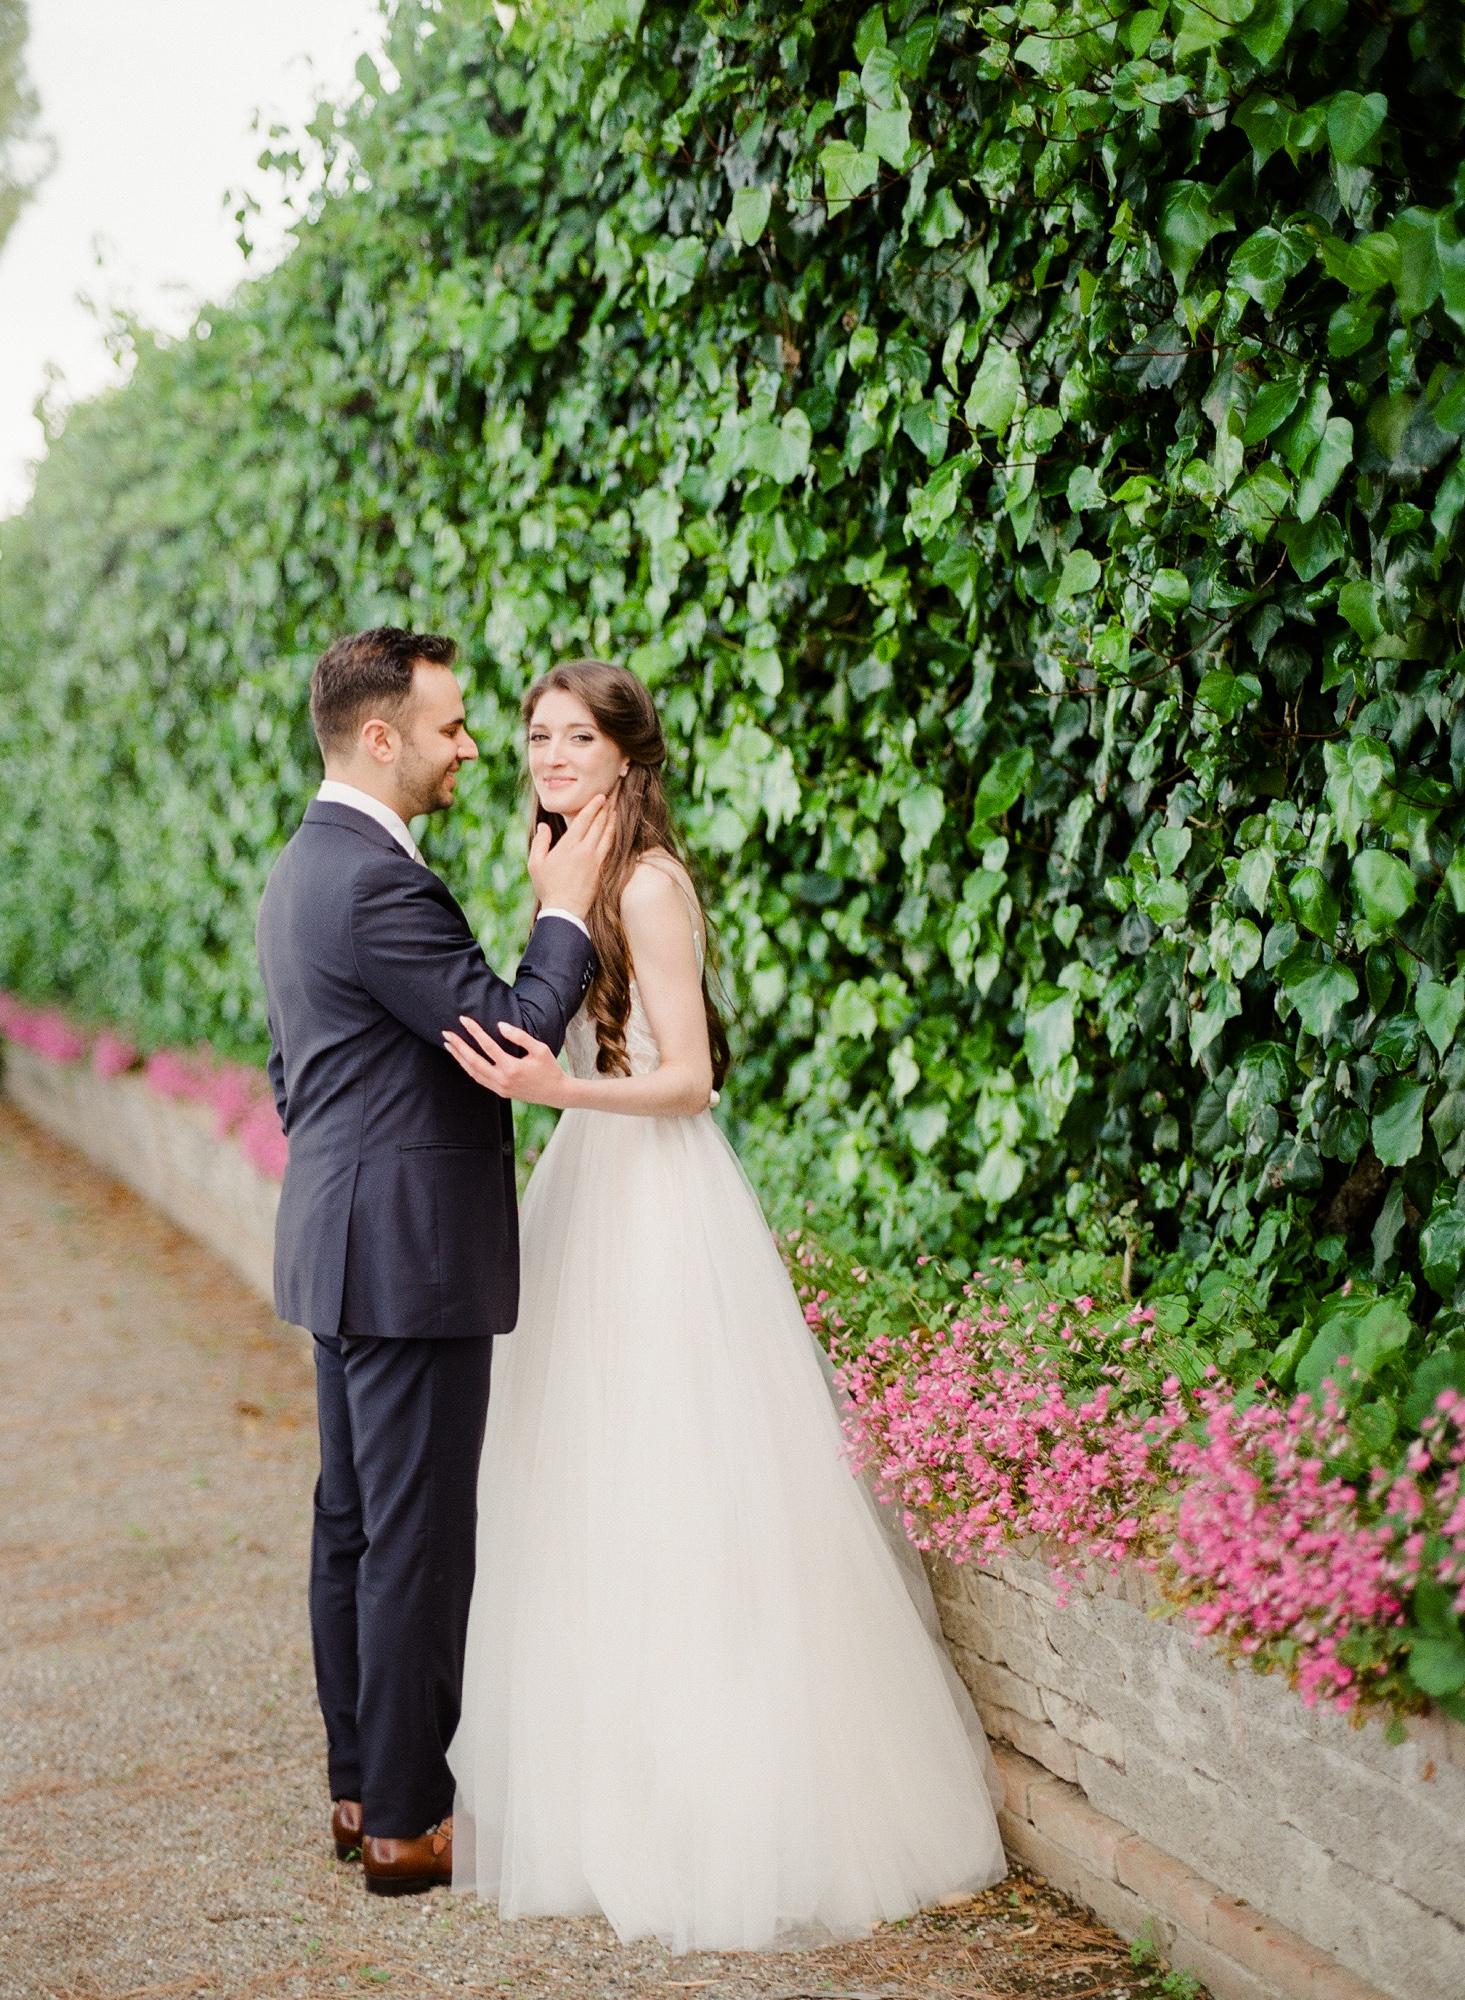 Tuscany-Wedding-Venues-19.jpg